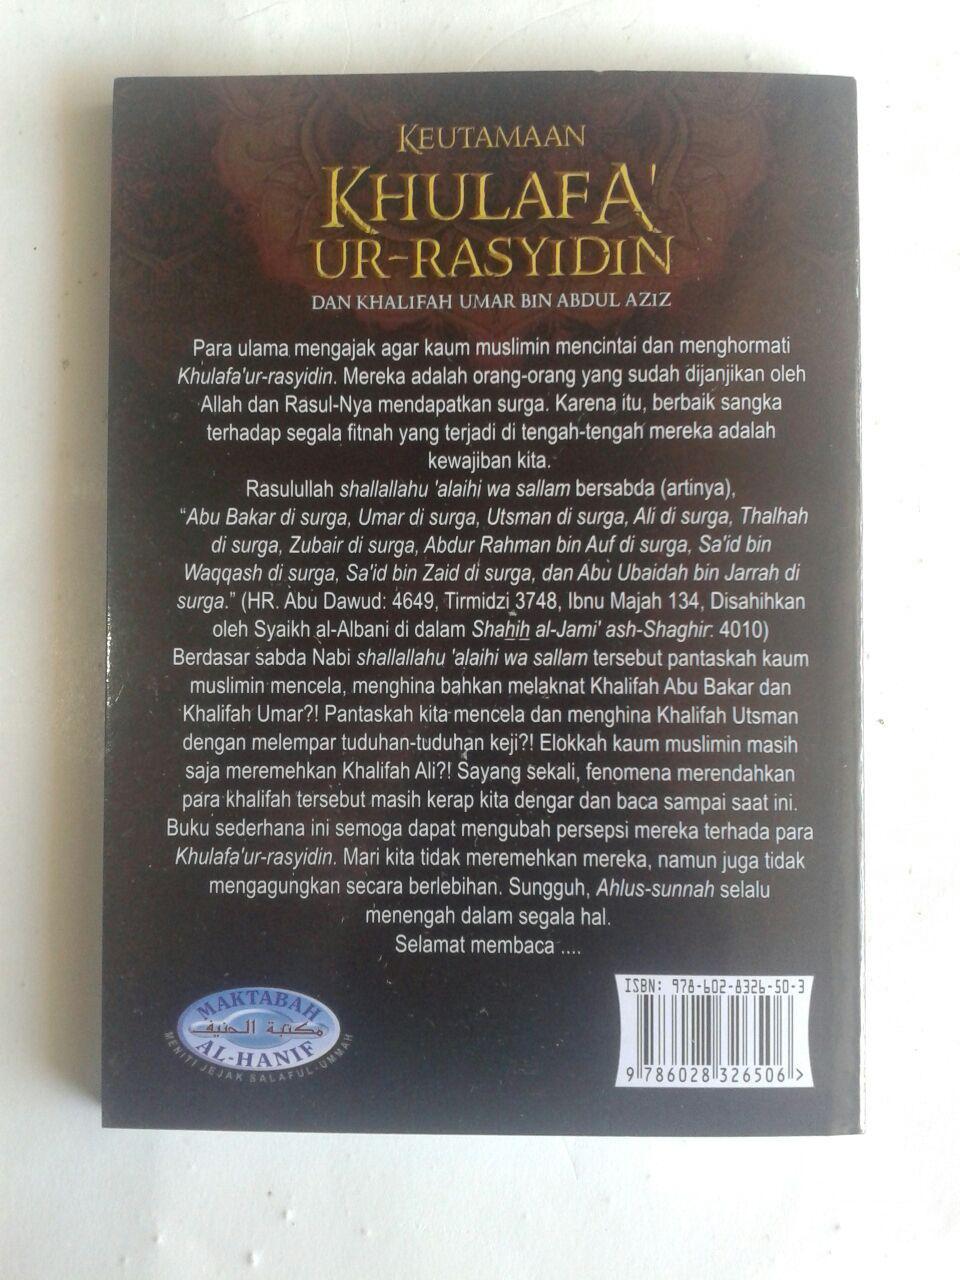 Buku Saku Keutamaan Khulafaur Rasyidin Dan Umar bin Abdul Aziz cover